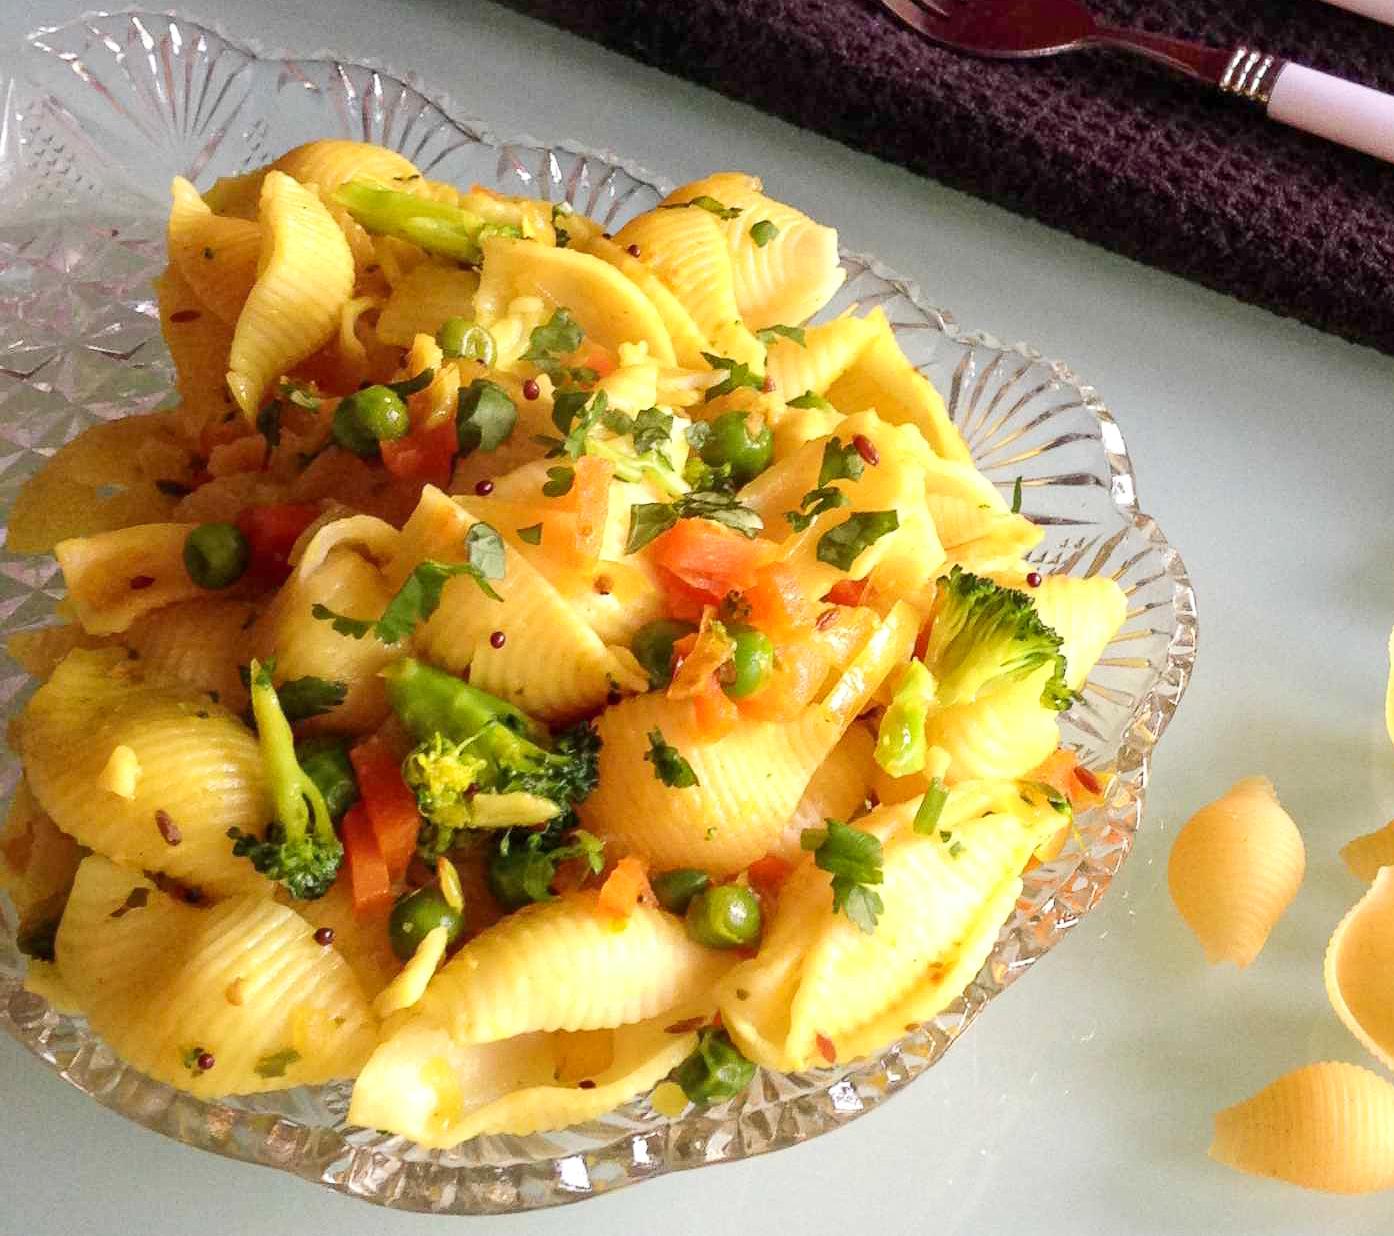 Desi style masala pasta recipe by archanas kitchen desi style masala pasta recipe indian style pasta forumfinder Gallery